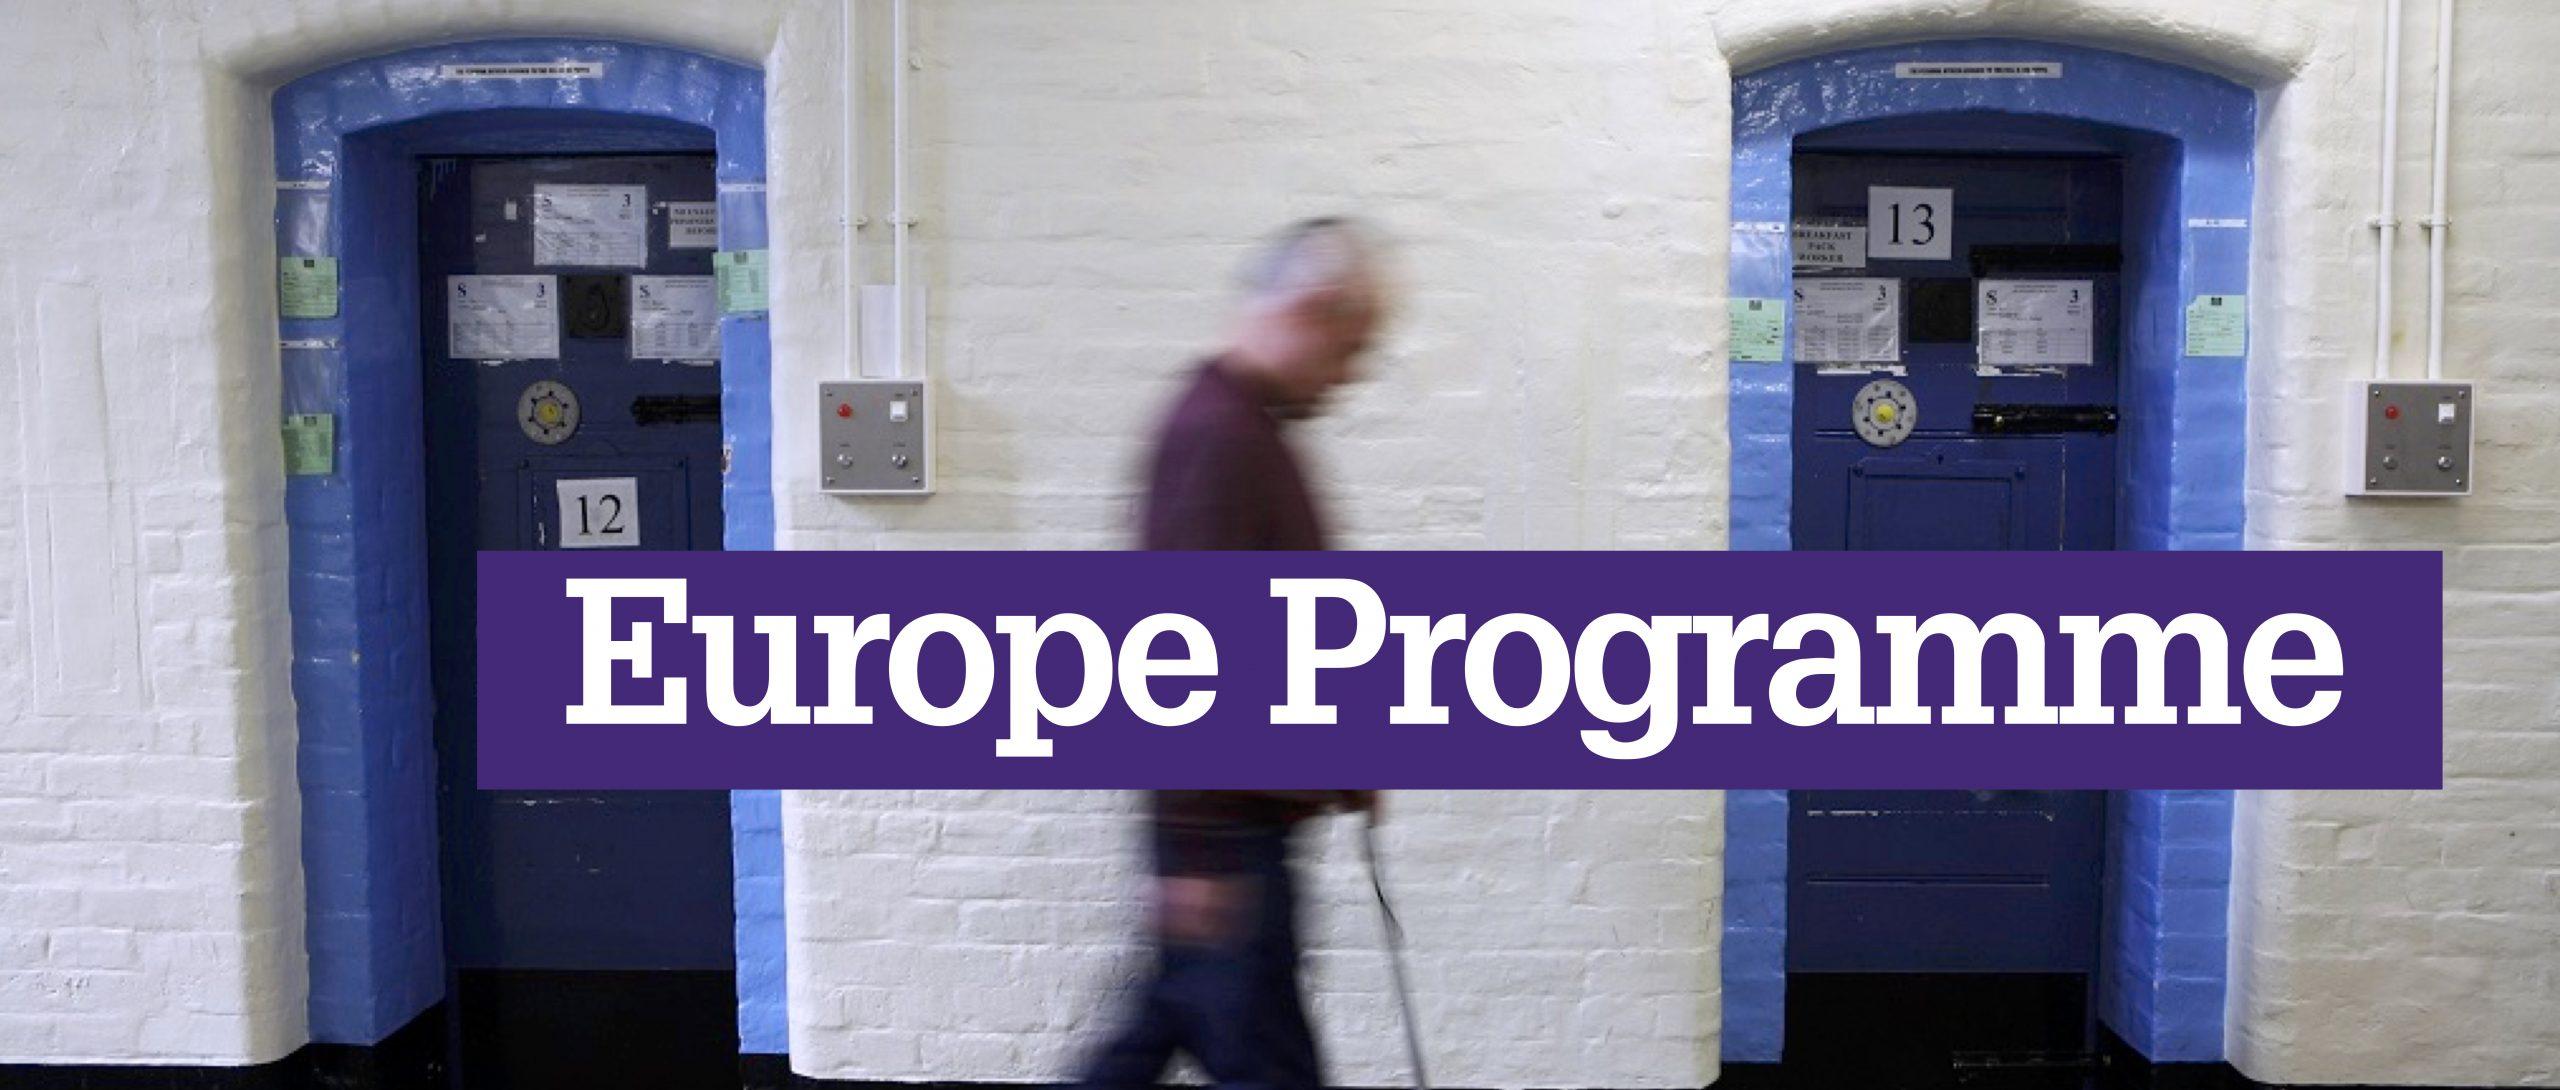 Europe Programme launch website